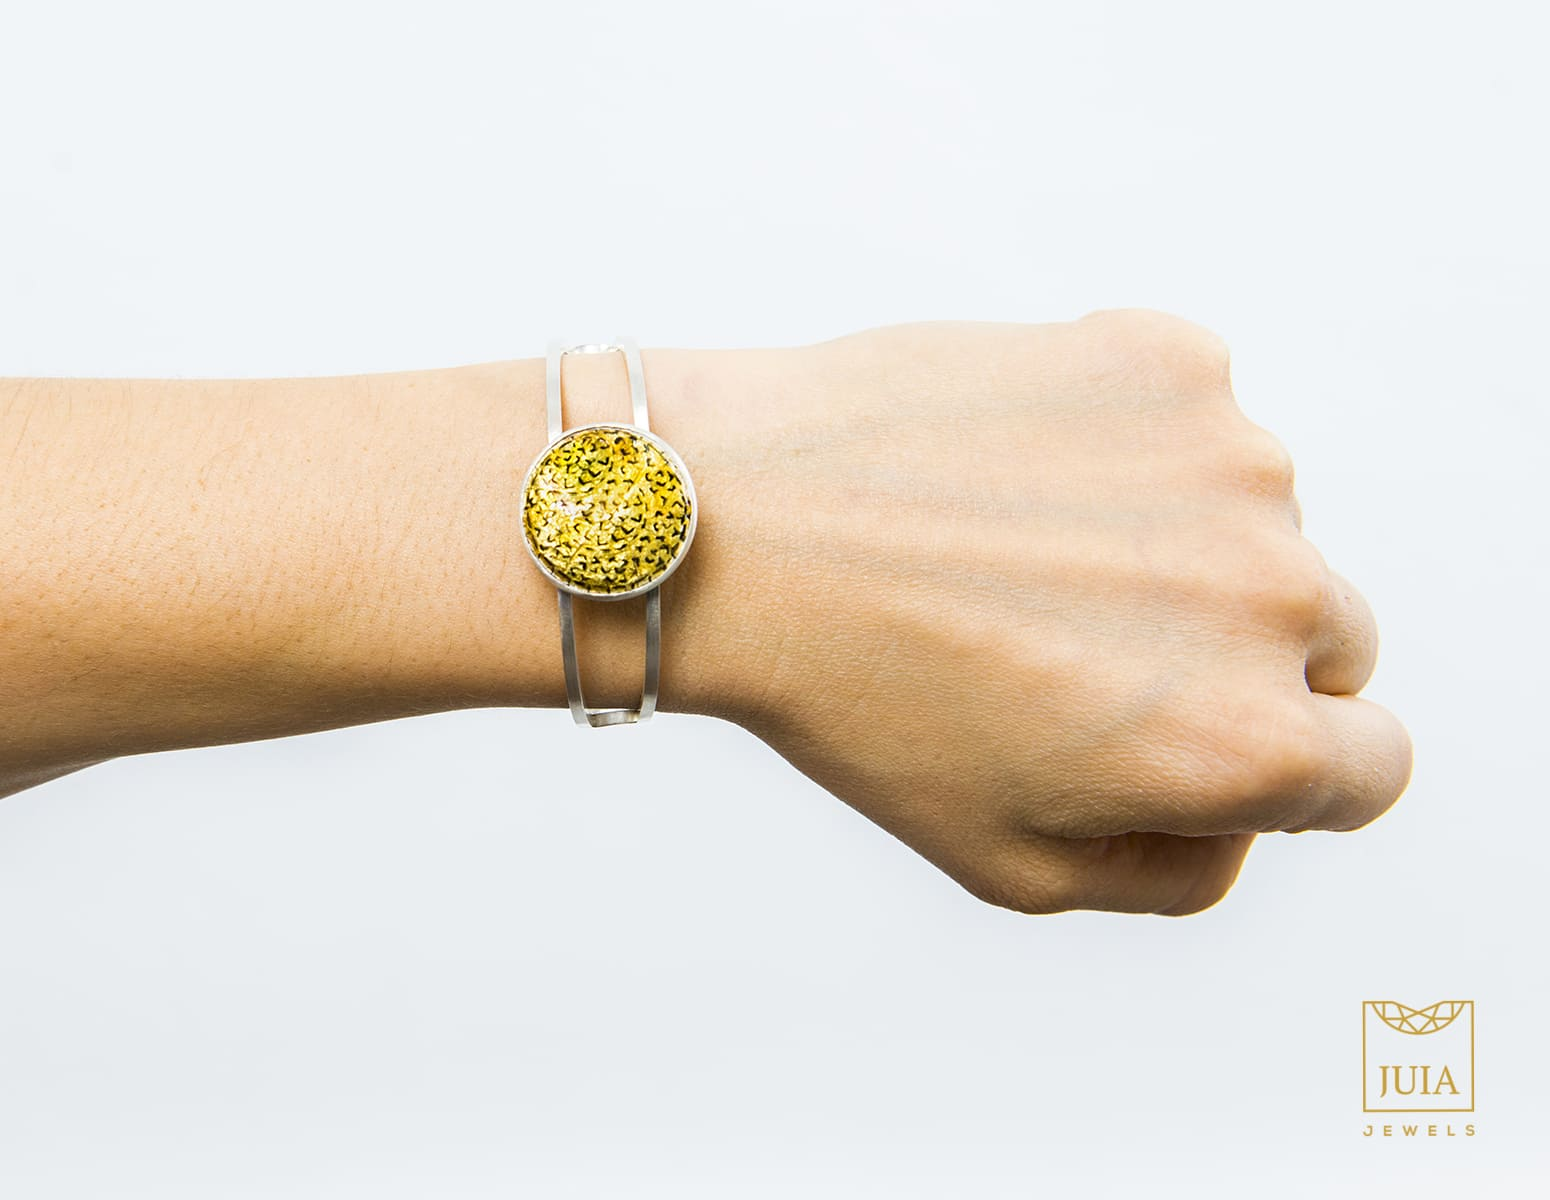 pulseras de plata para mujer, juia jewels barcelona, regalar pulseras de plata de diseño, joyeria etica, fairmined, joyasmarket